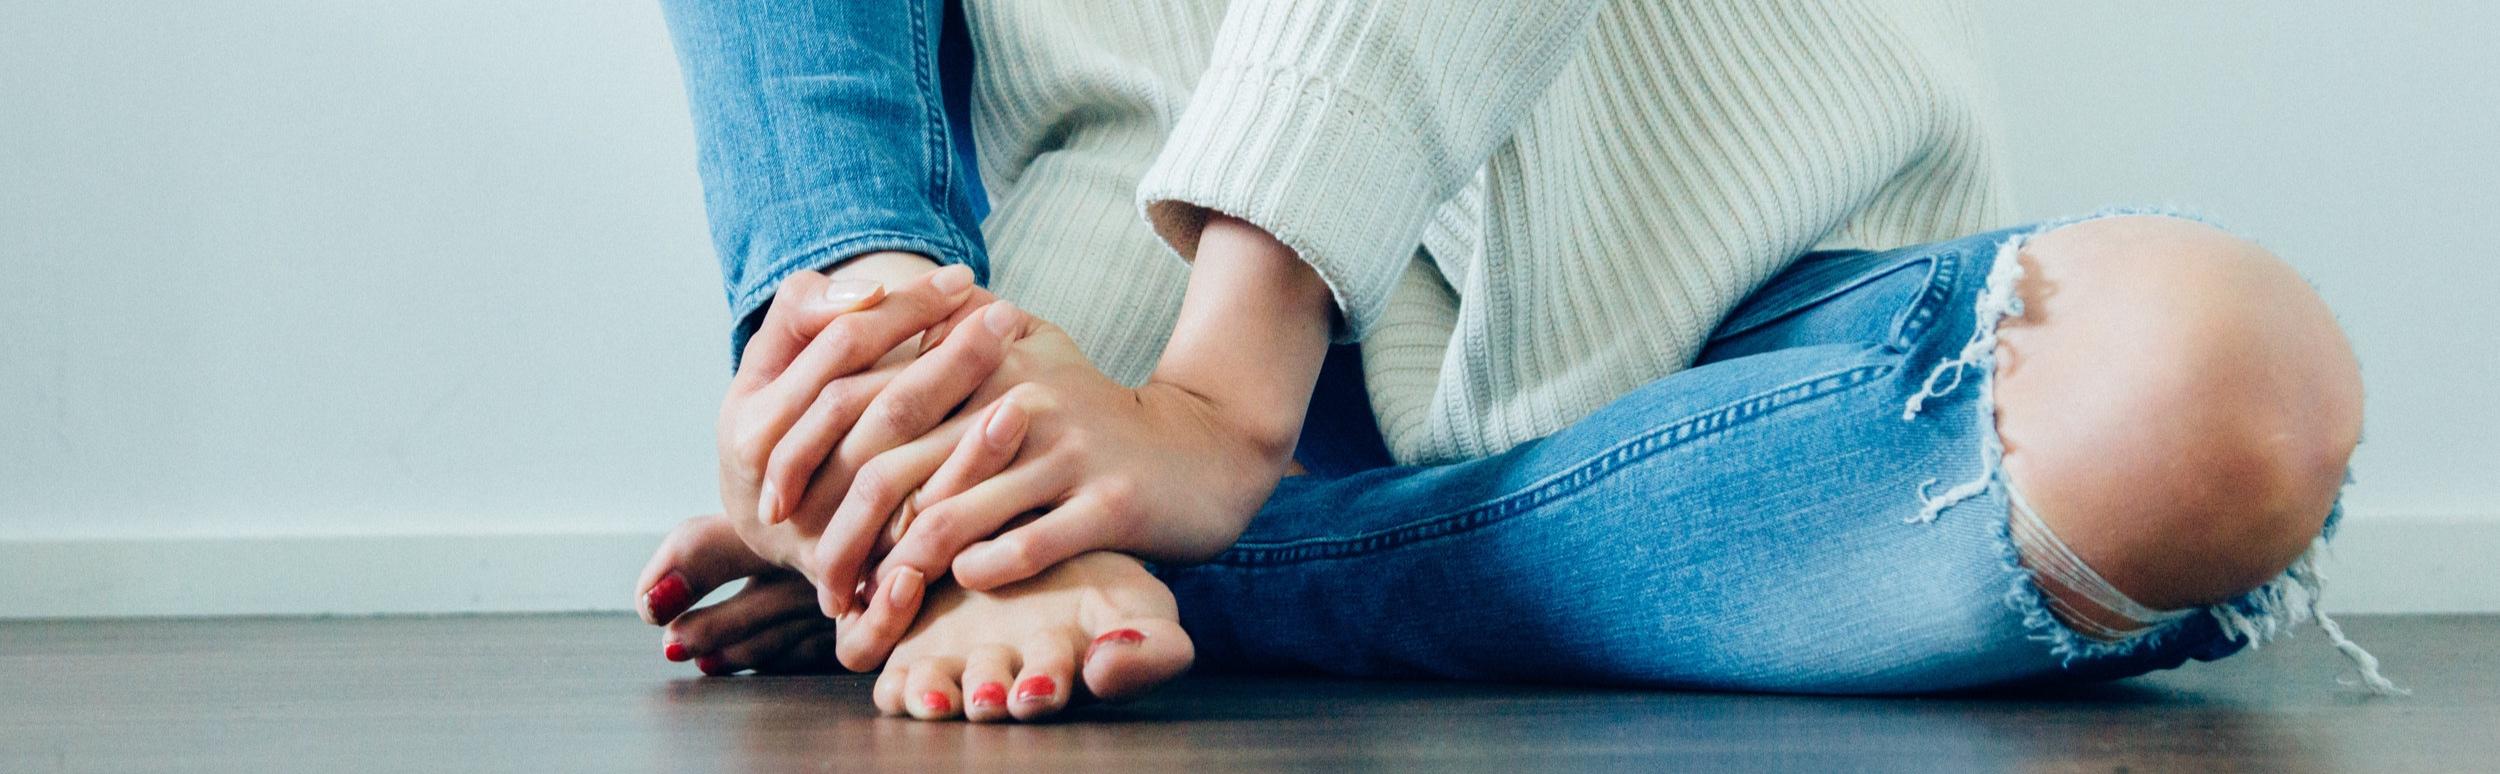 Ankle Arthrodesis - Ankle Fusion